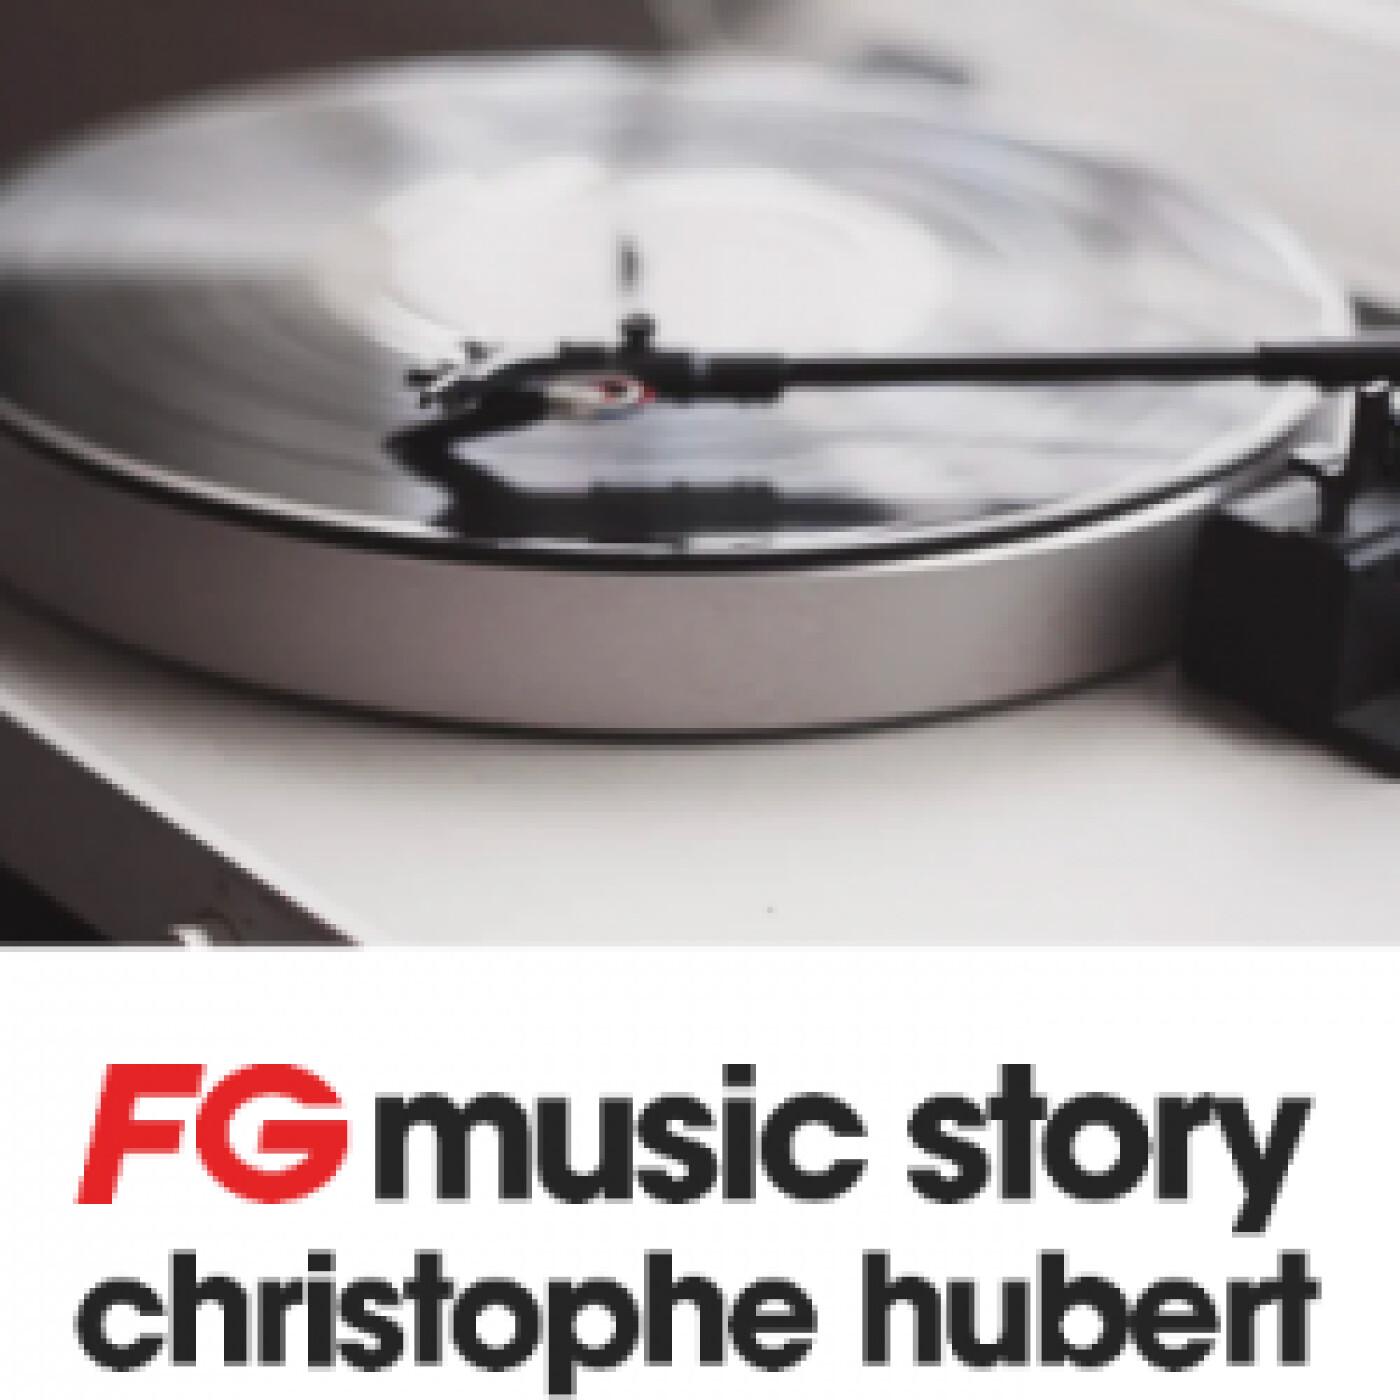 FG MUSIC STORY : INDEEP